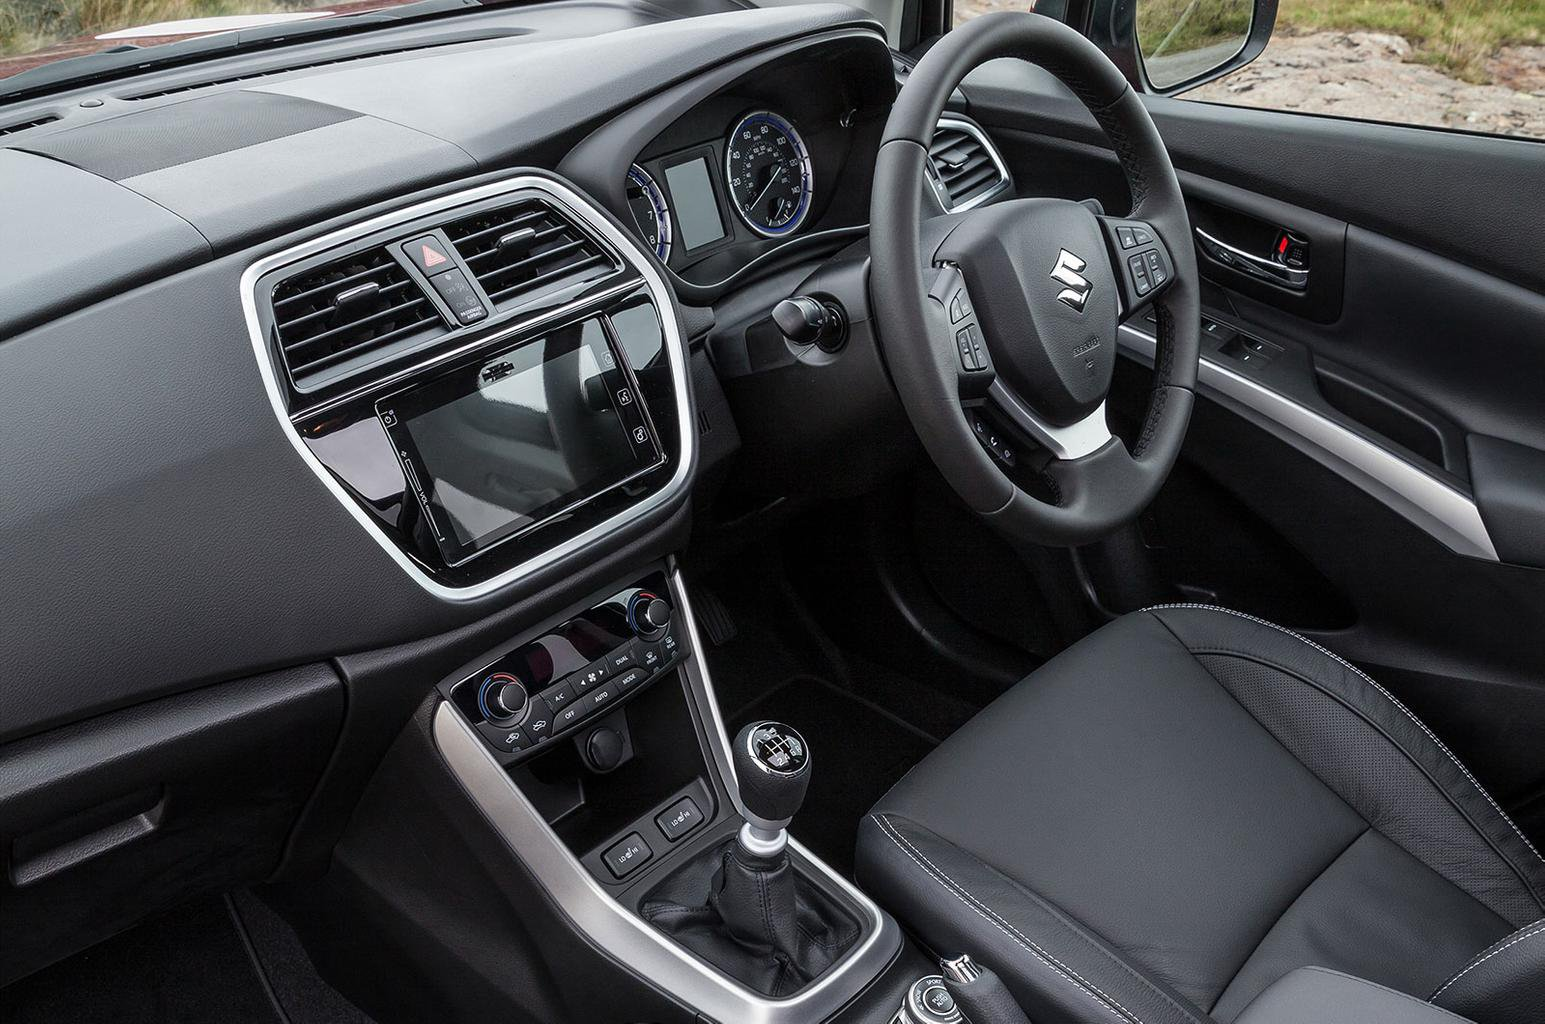 Facelifted Suzuki SX4 S-Cross revealed